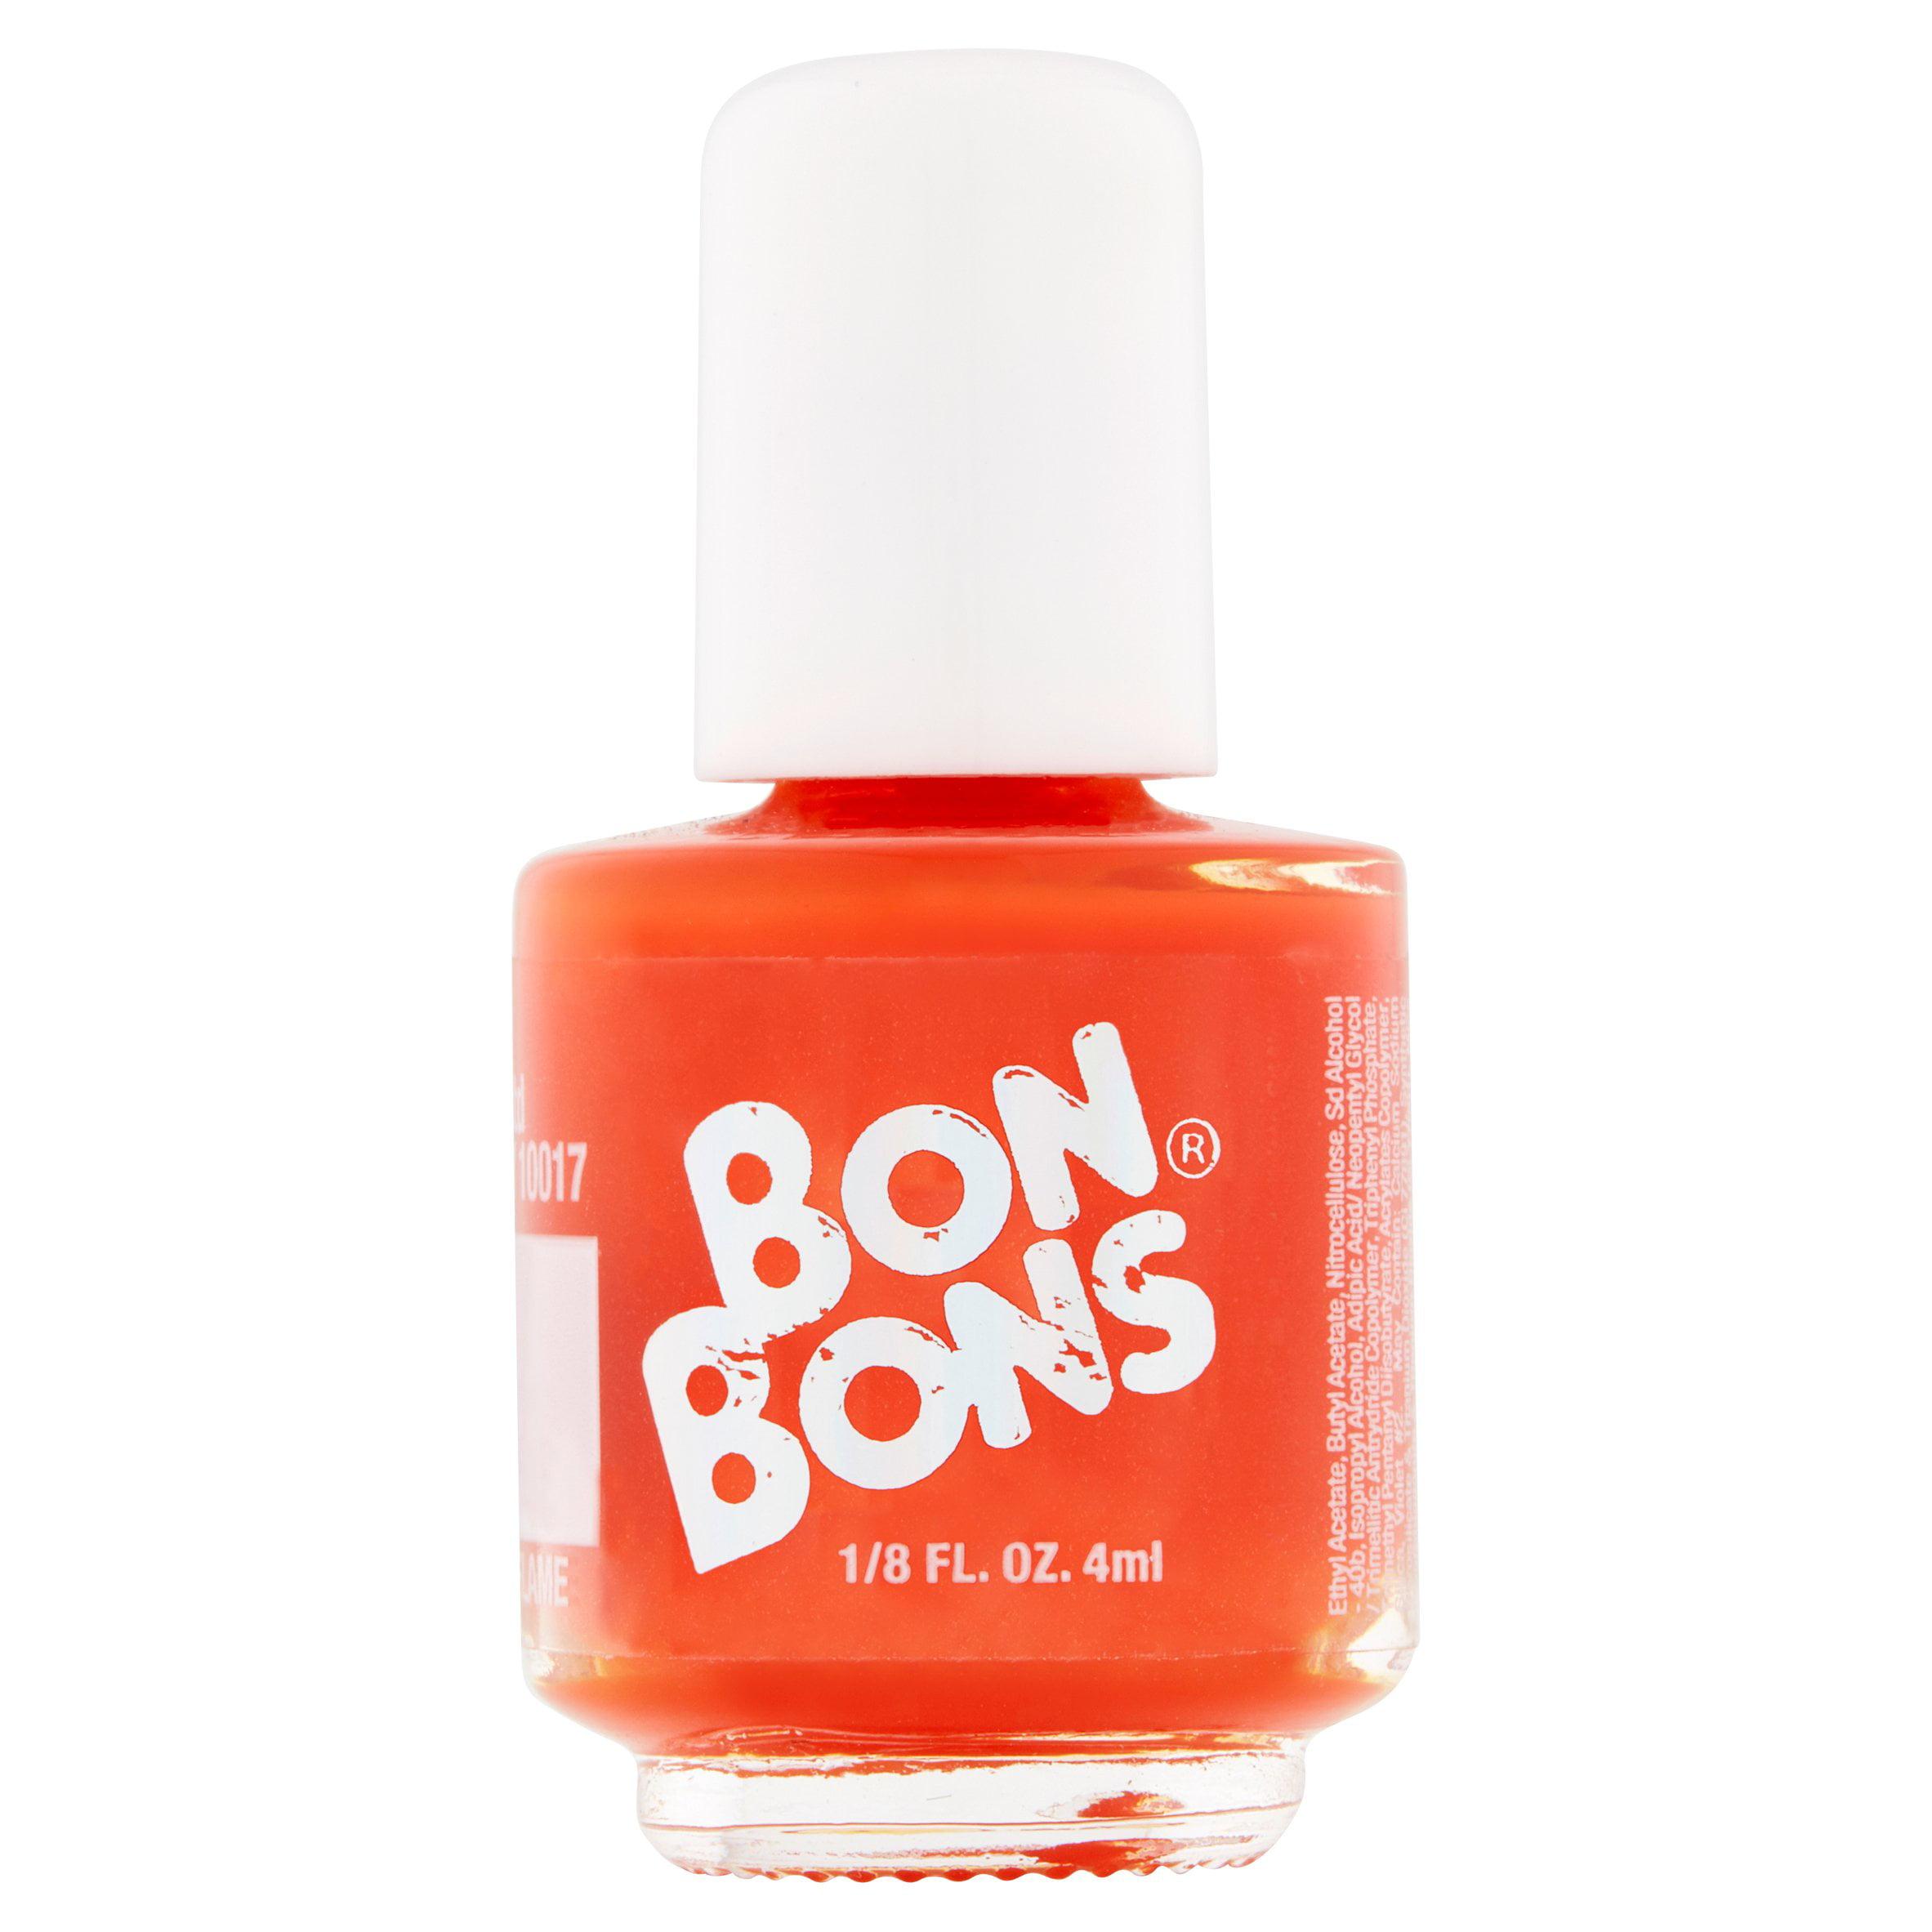 Bon Bons Bright Orange Cream Nail Polish, 1/8 fl oz - Walmart.com